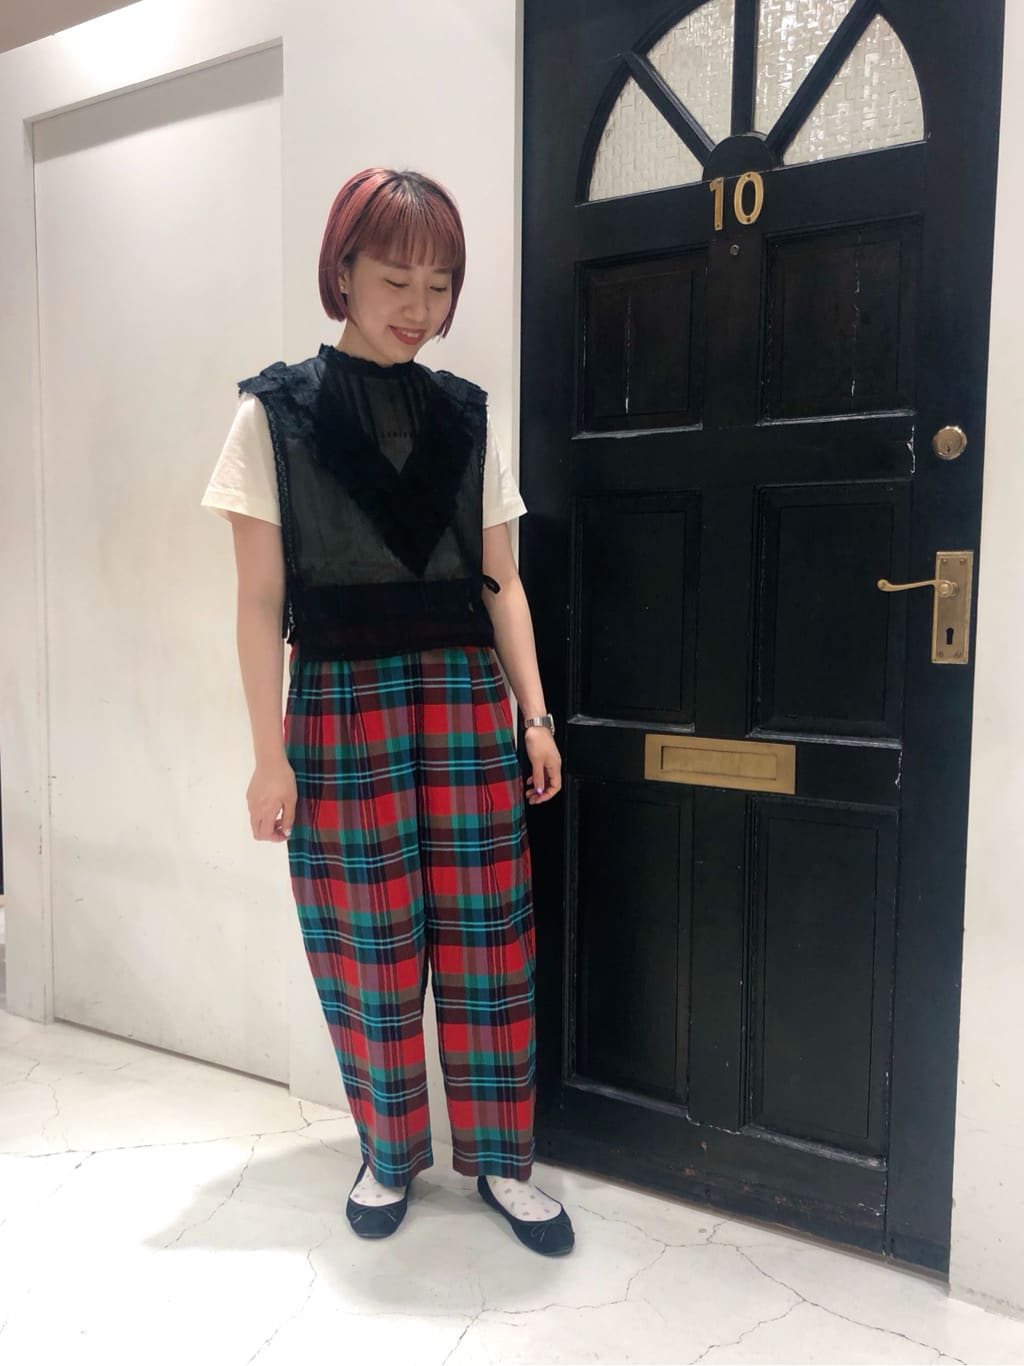 Dot and Stripes CHILD WOMAN ルクアイーレ 身長:157cm 2021.07.28